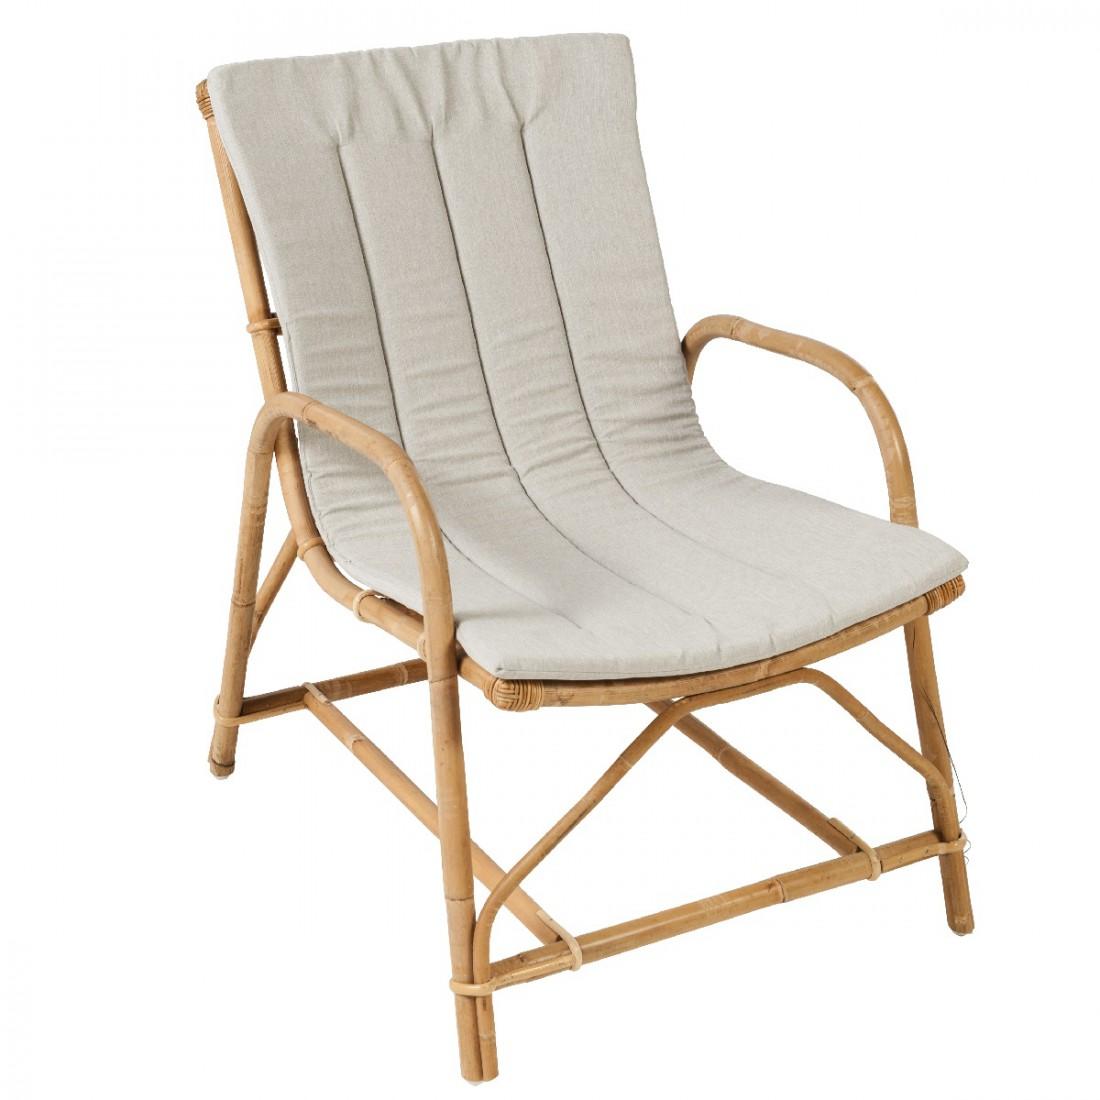 coussin pour fauteuil olivier fauteuil rotin kok. Black Bedroom Furniture Sets. Home Design Ideas